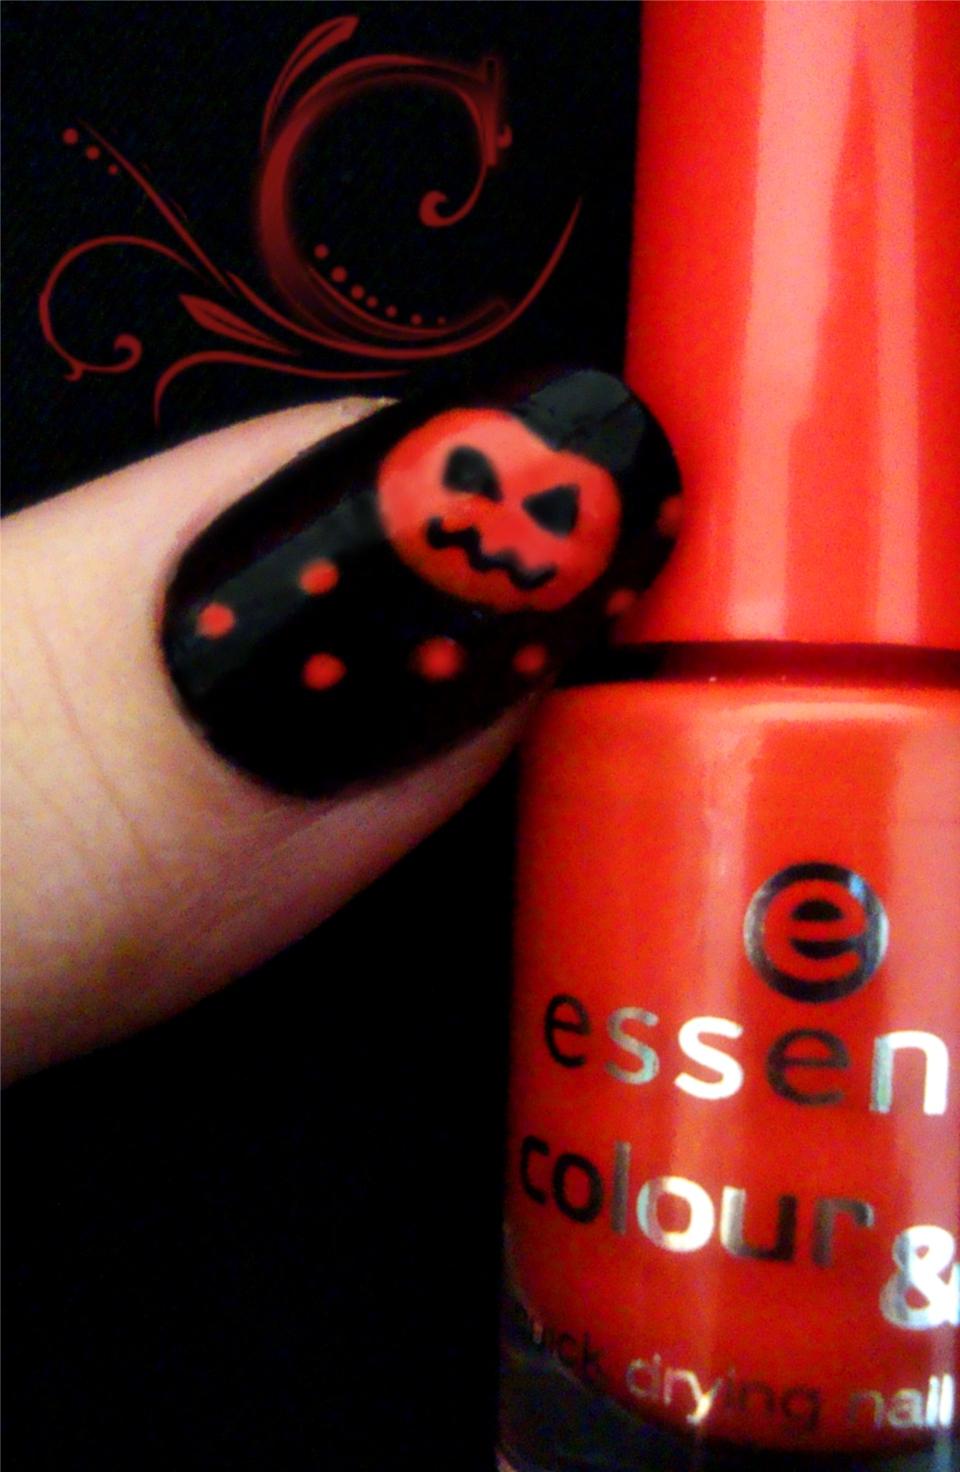 Nageldesign zum Halloween 30 Ideen zum Selbermachen - nageldesign halloween anleitung